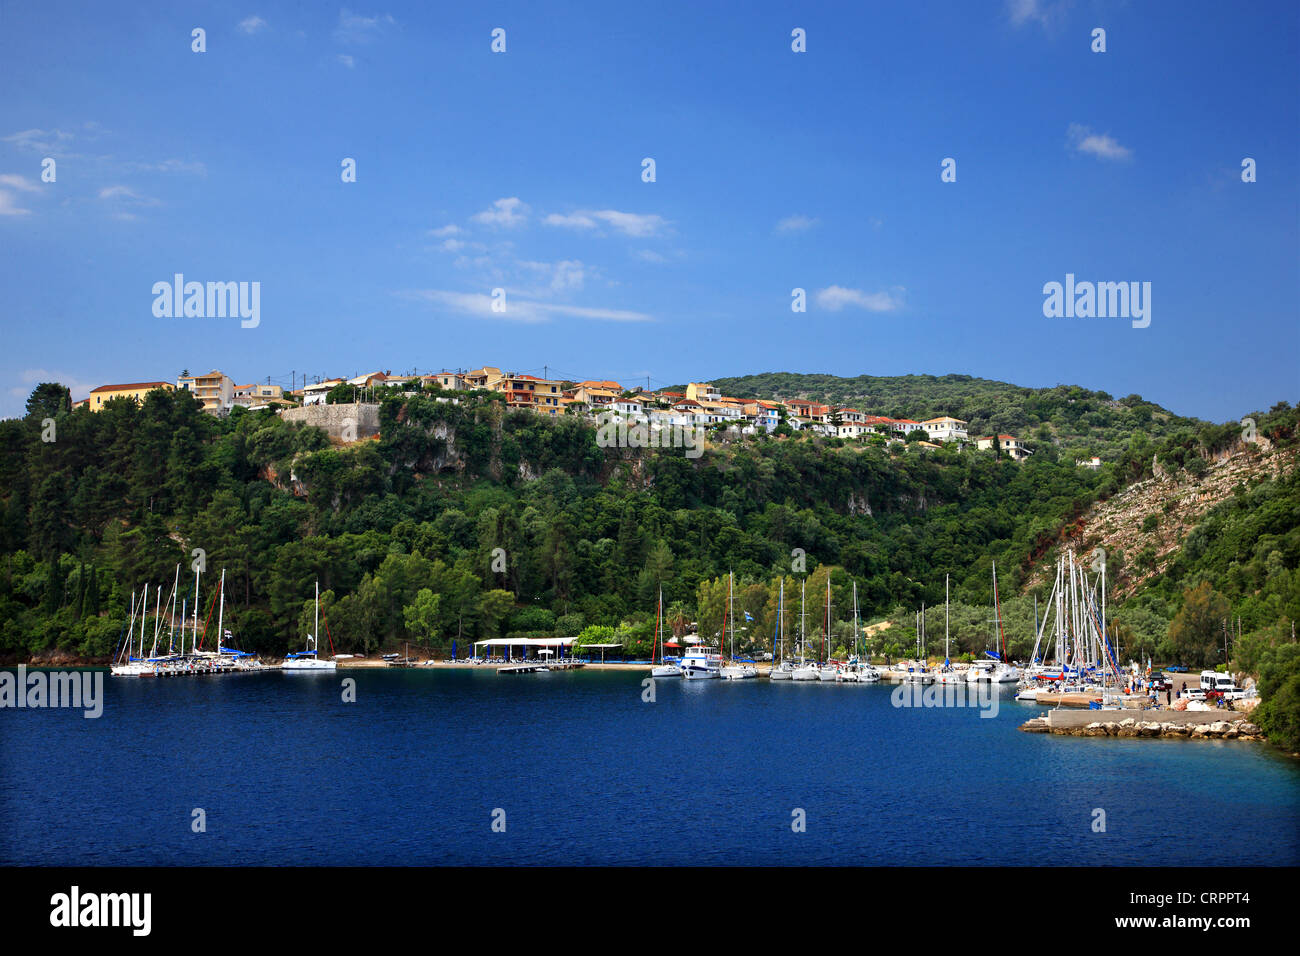 Yachts at the marina in Spilia bay, close to Spartochori village, Meganisi island (Lefkada prefecture), Ionian sea, - Stock Image